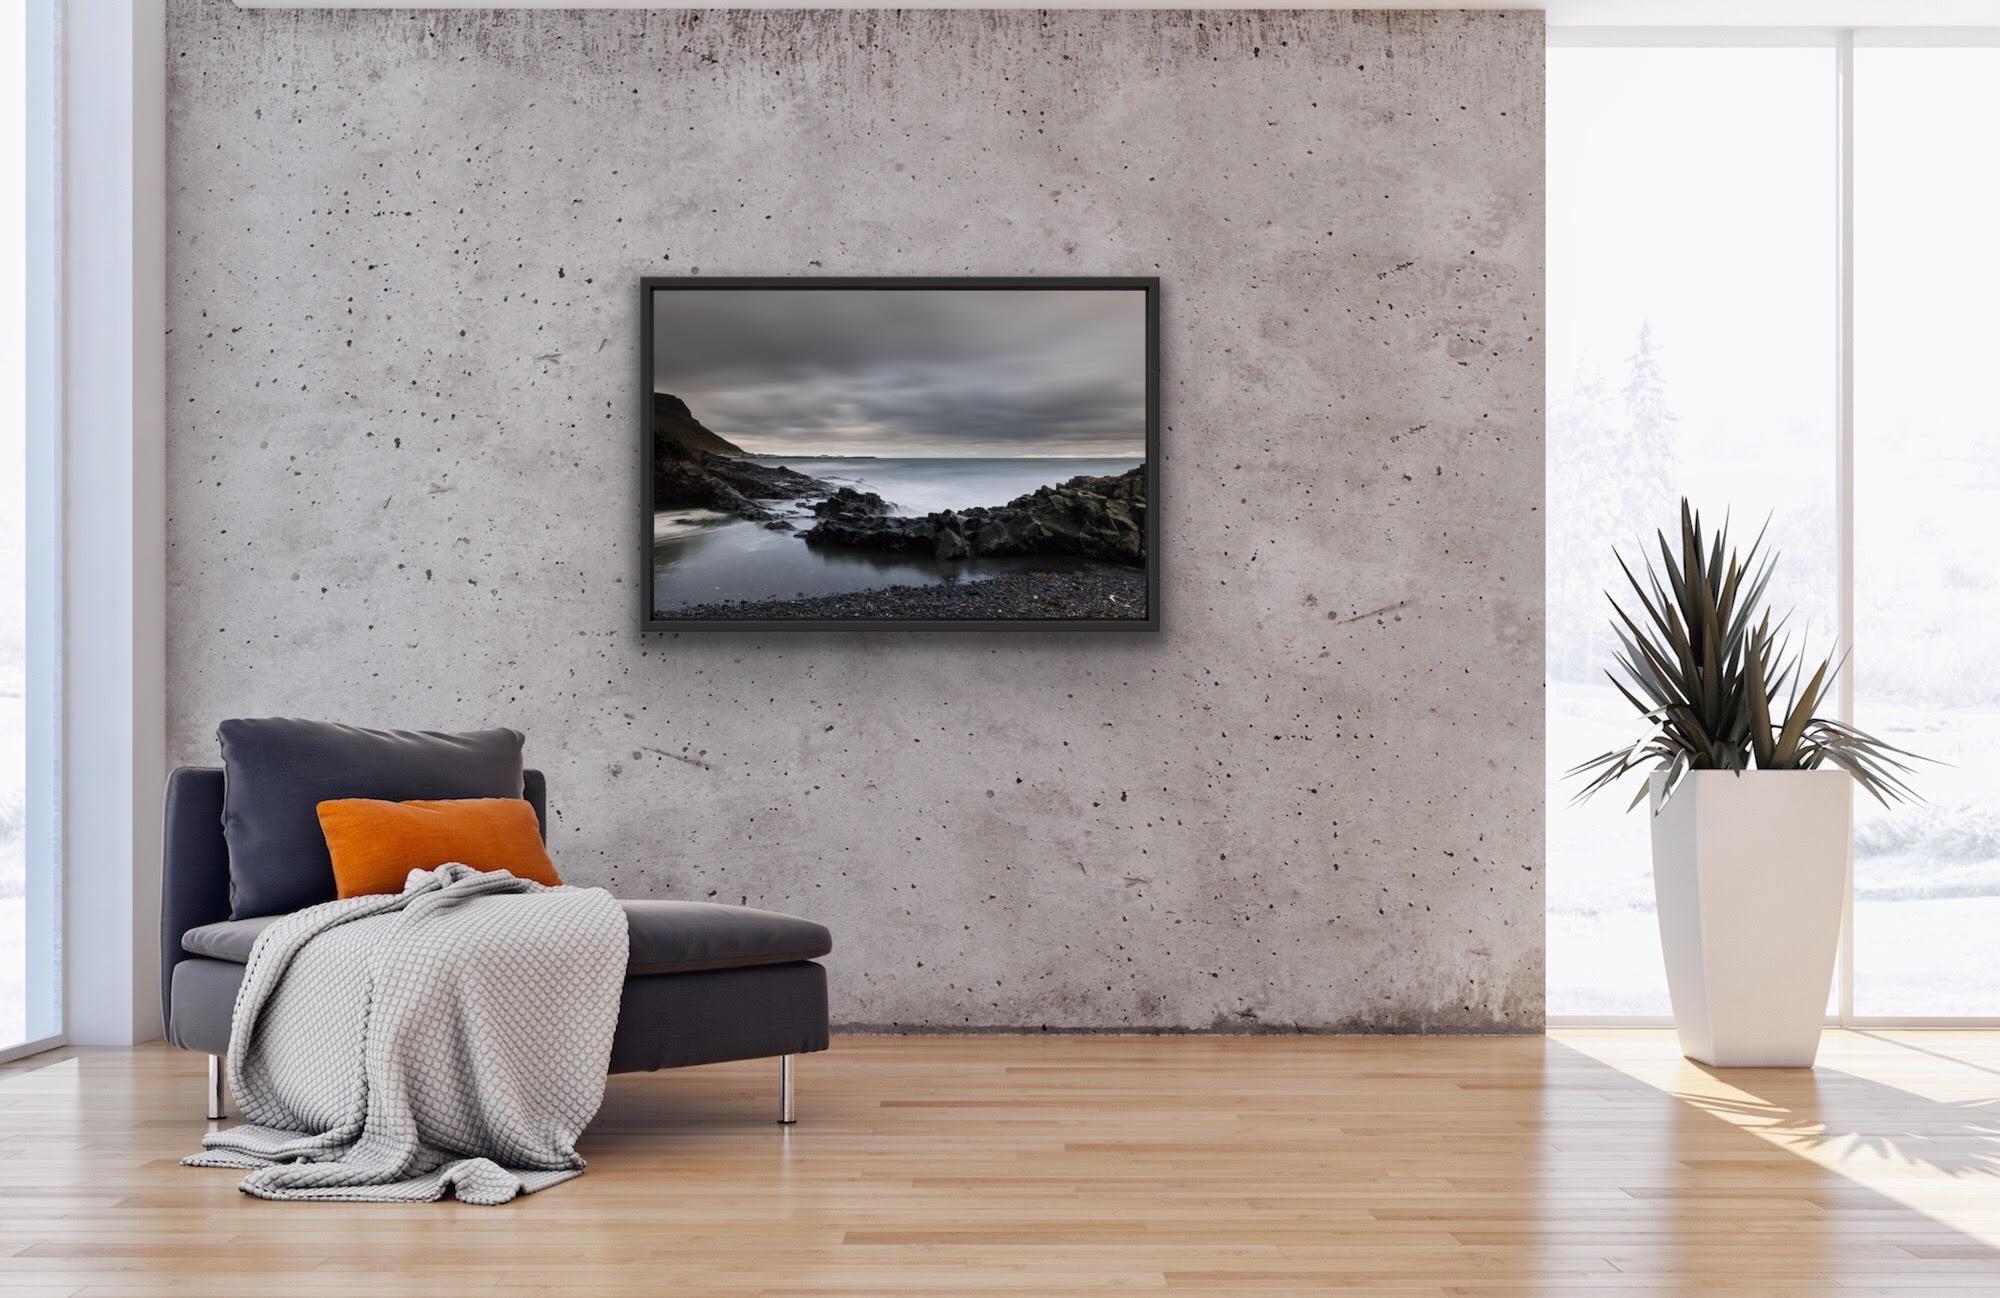 Tirage d'art - Mickaël Bonnami Photographe - Islande